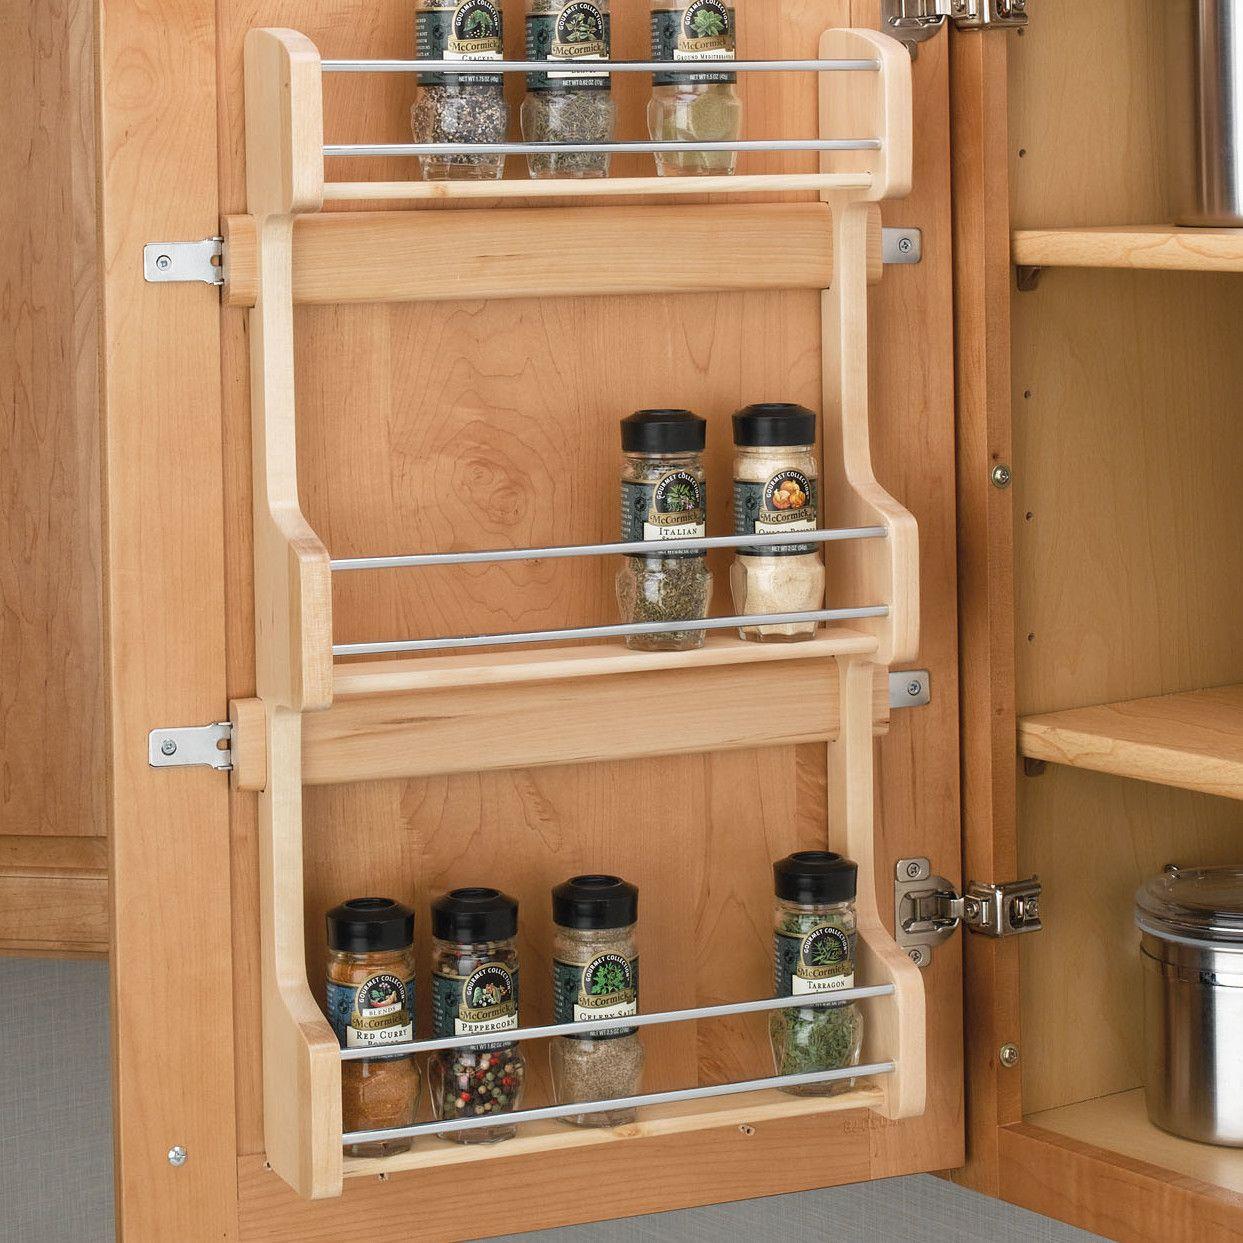 Rev a shelf cabinet door mount 3 shelf spice rack reviews wayfair